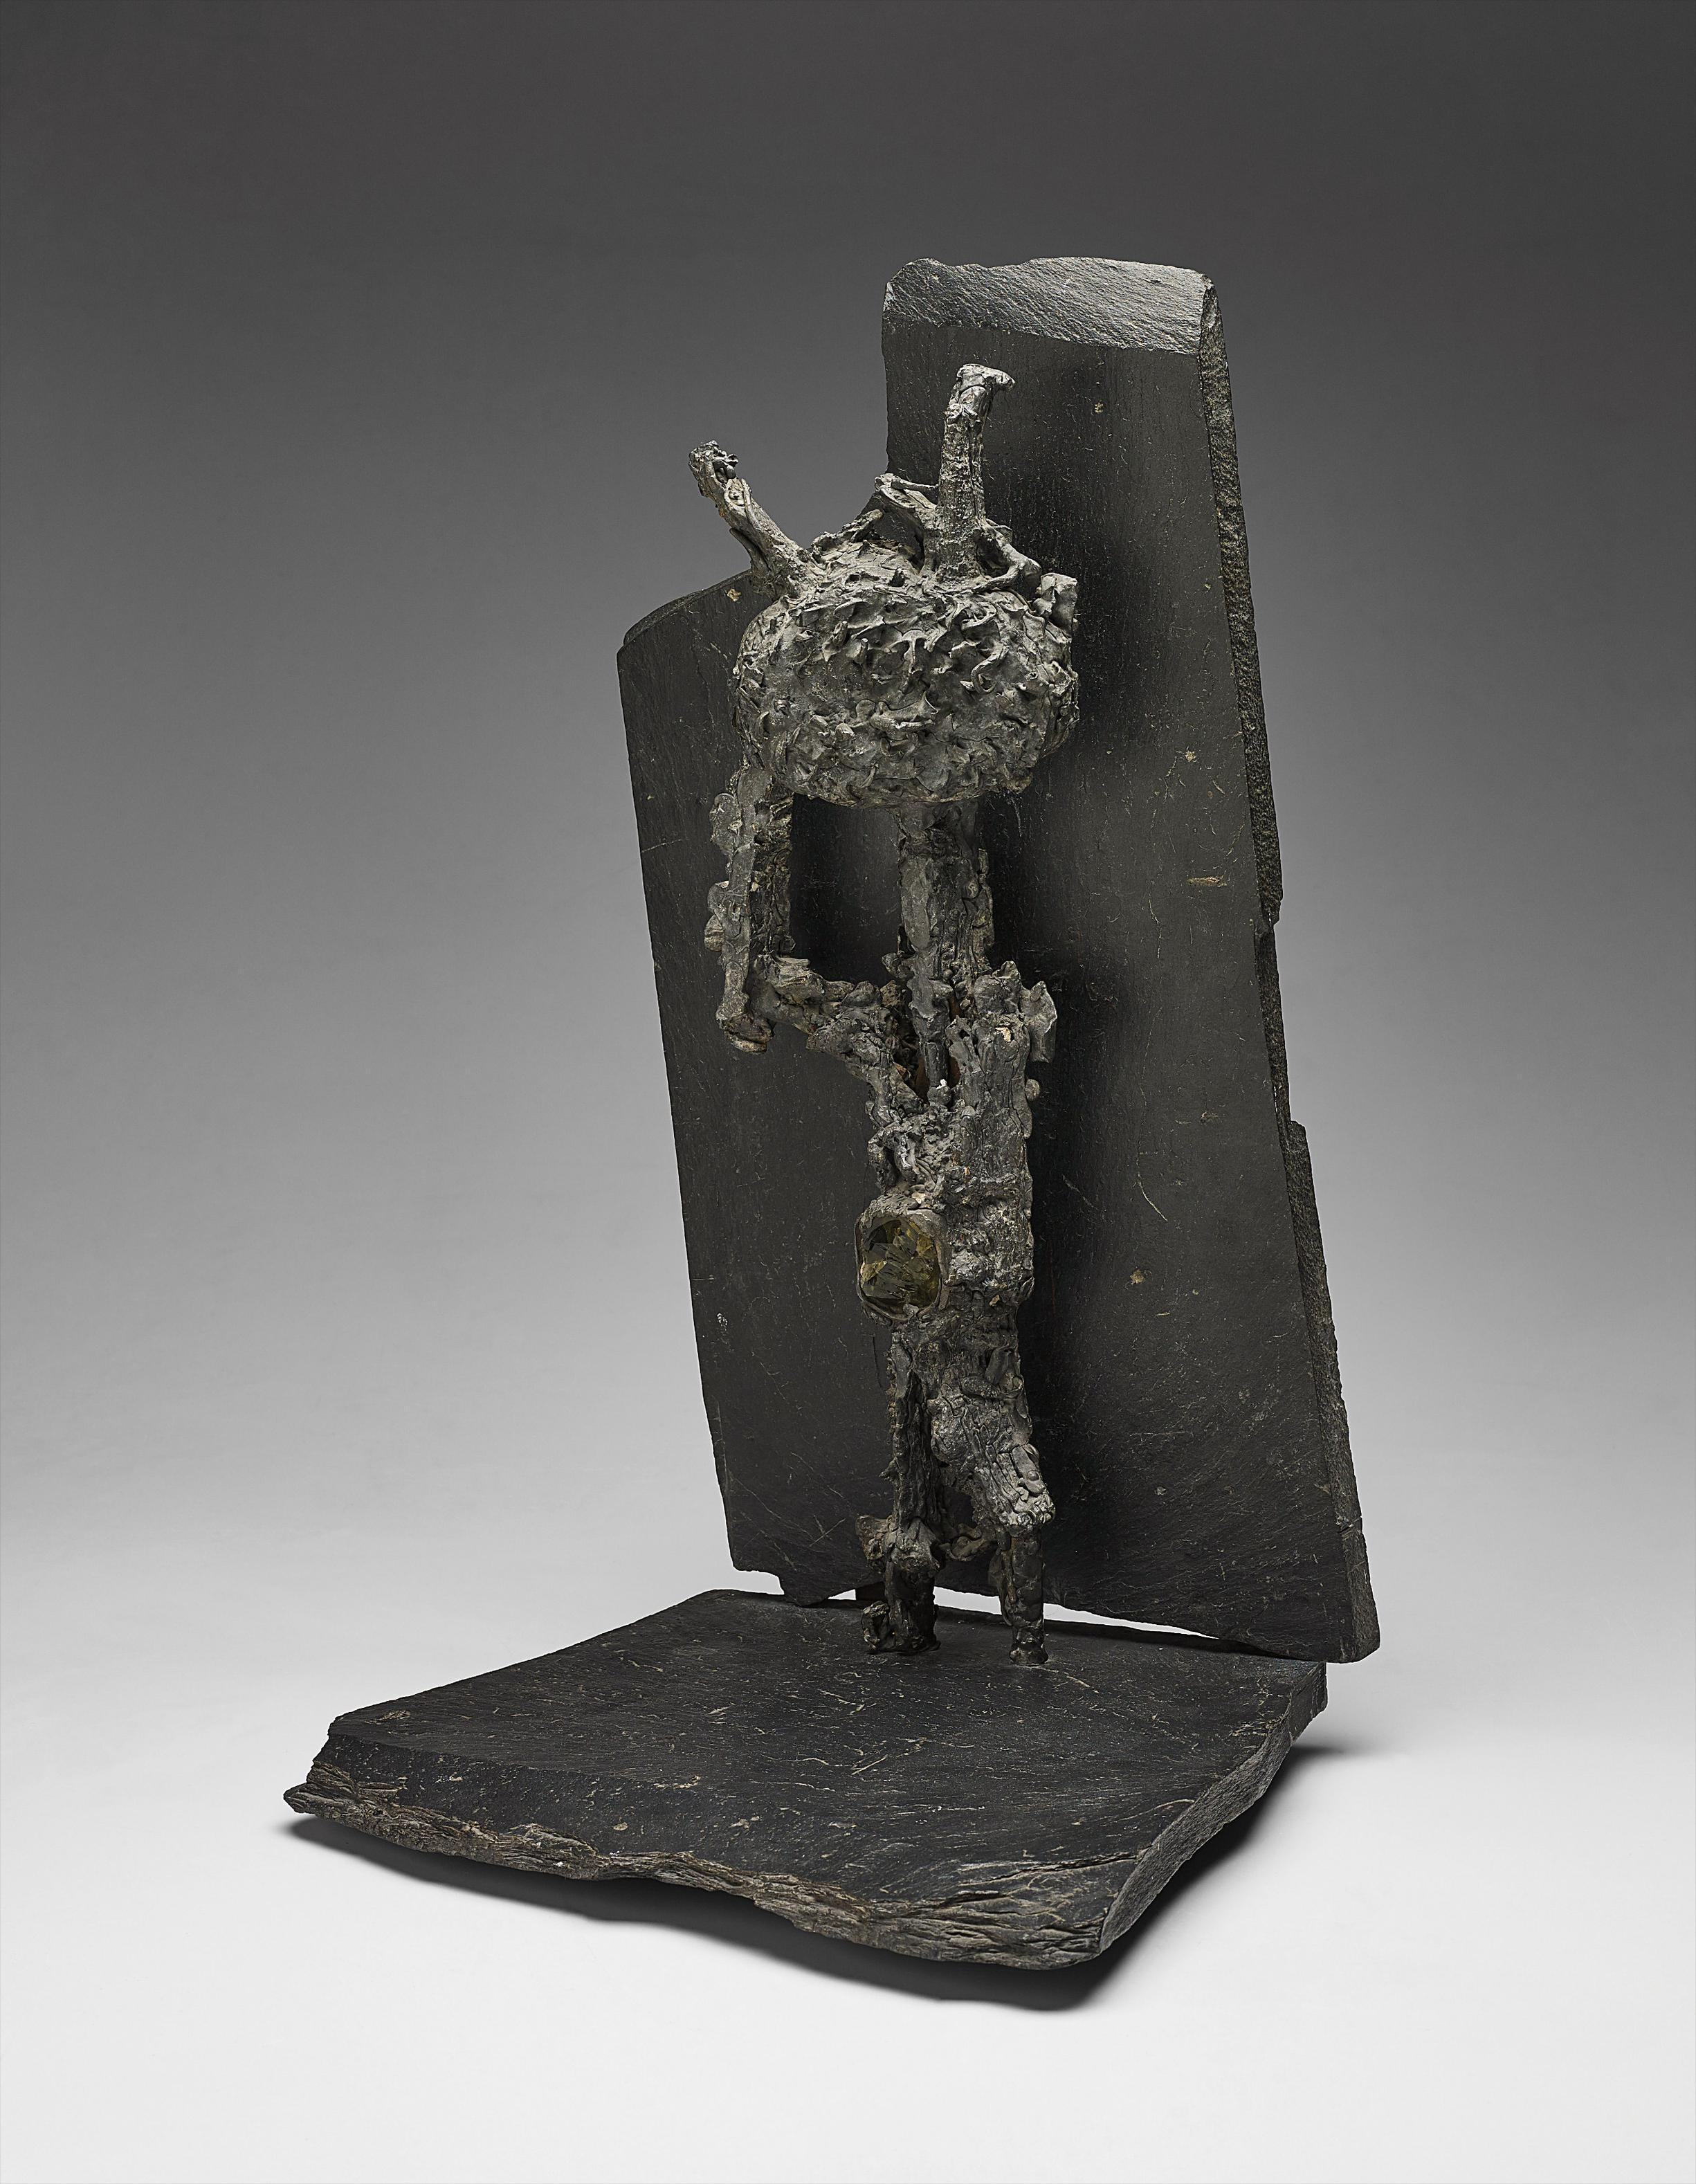 Germaine Richier-Untitled-1959